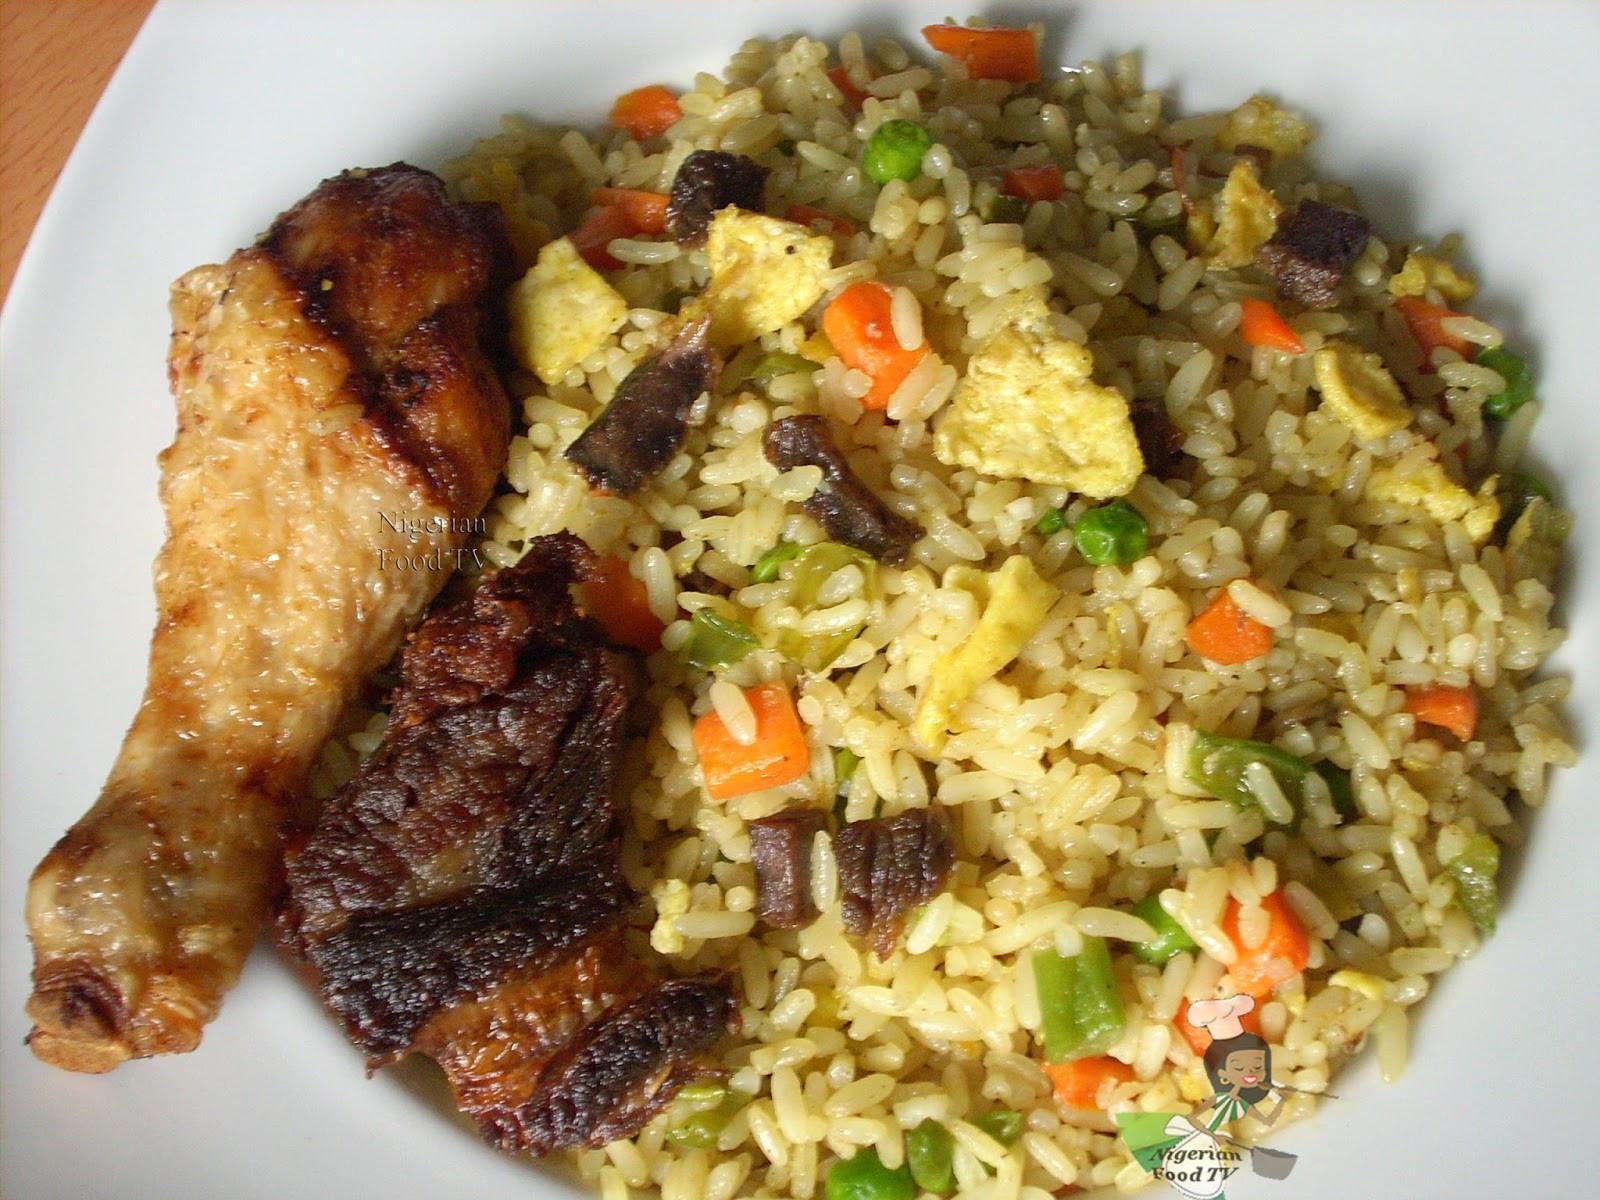 Nigerian Fried Rice  Nigerian Fried Rice How to Cook Nigerian Fried Rice